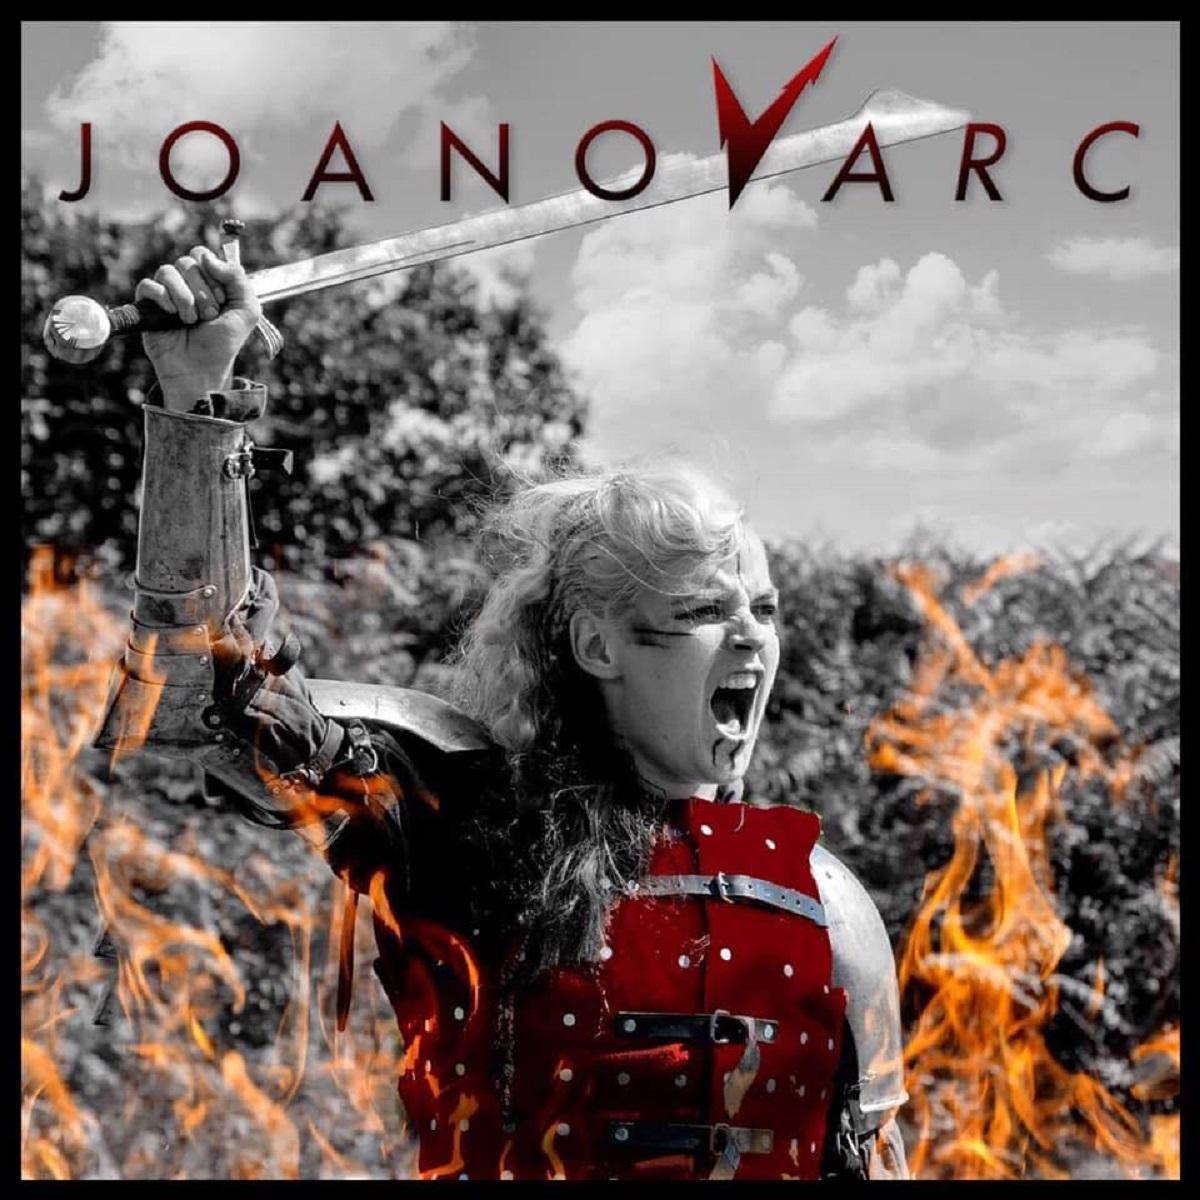 Review: Joanovarc – Joanovarc